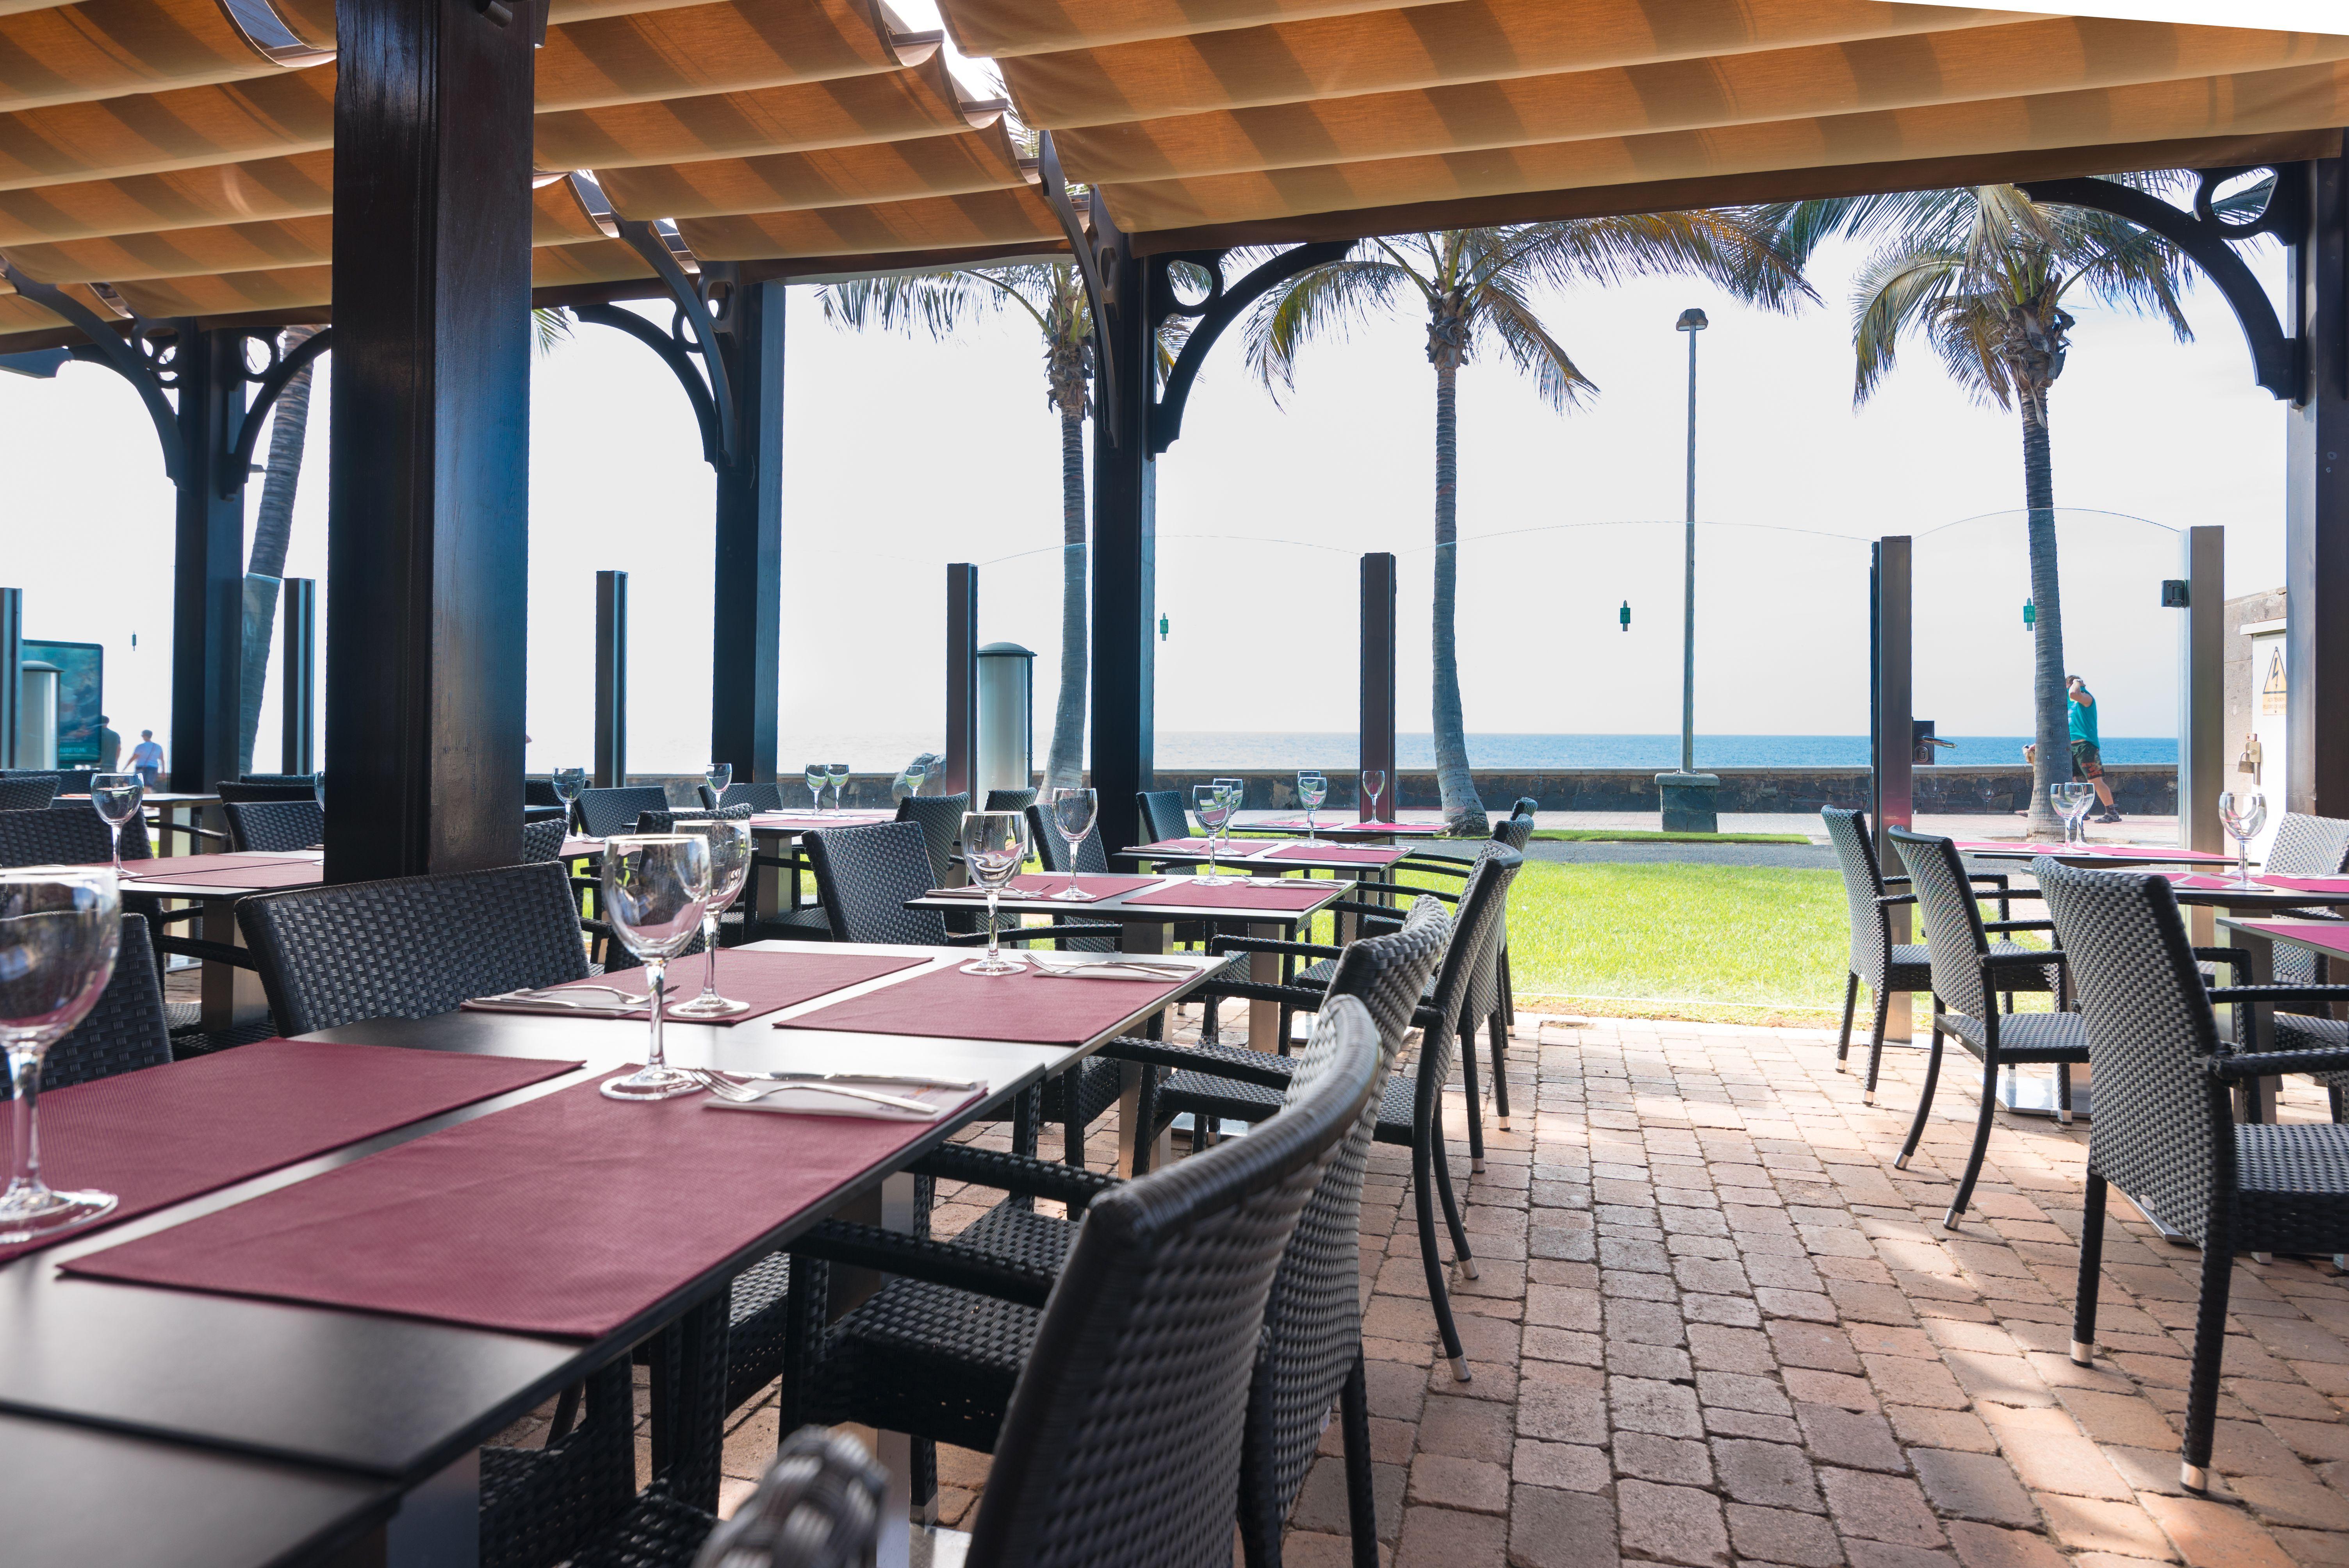 Foto 9 de Fusion food restaurant en San Bartolomé de Tirajana | Restaurante SushiMex